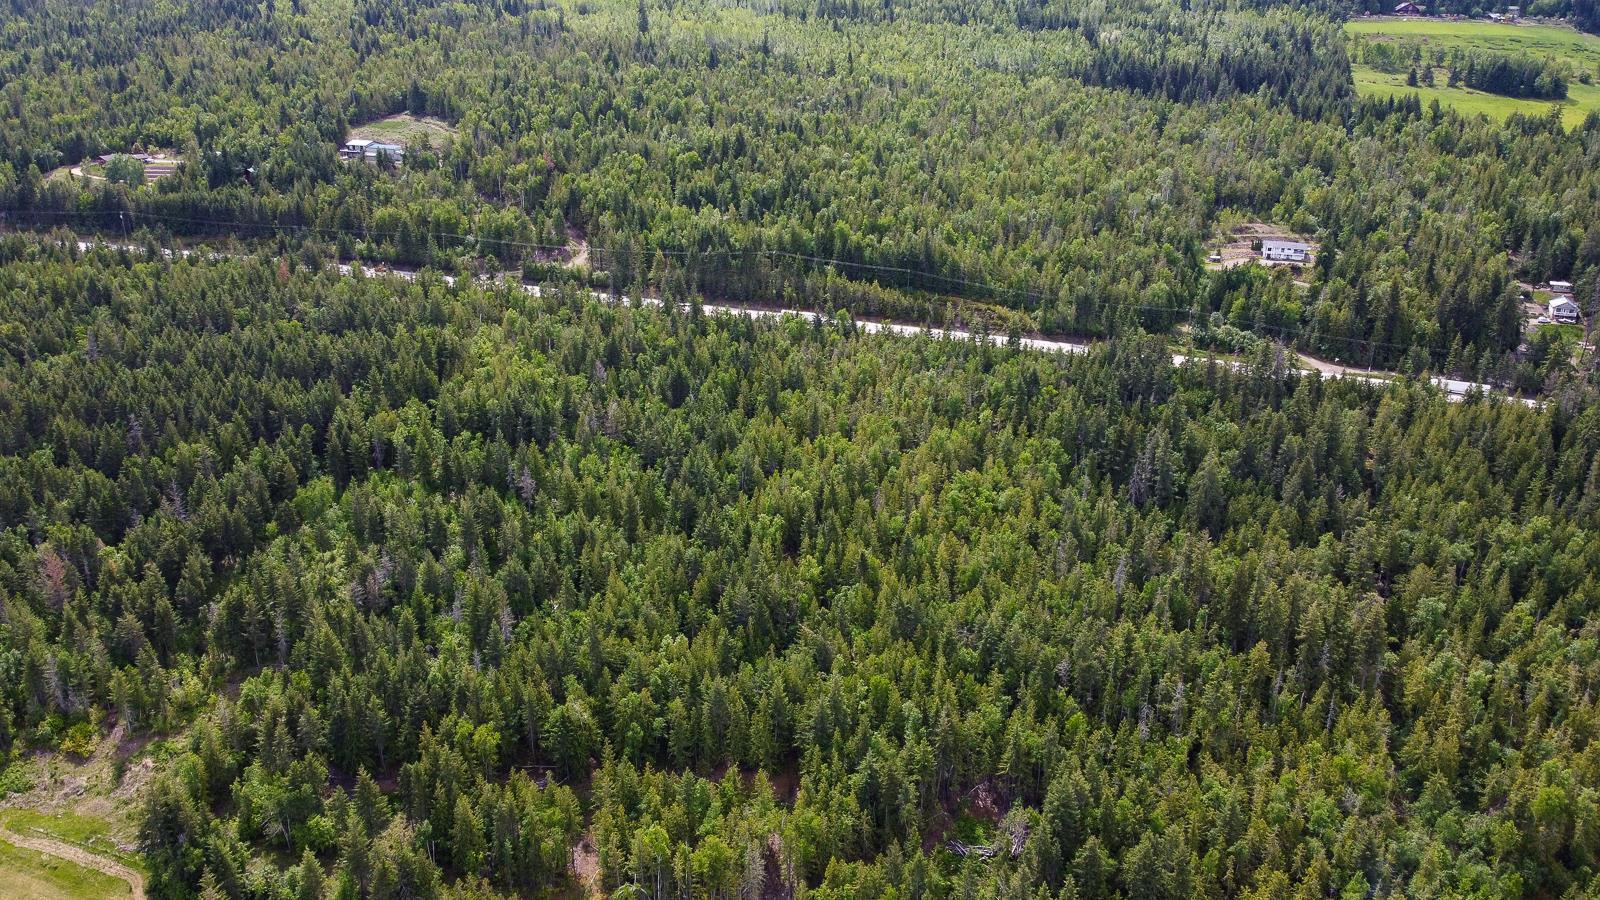 Lot 1-5 Blind Bay Road,, Blind Bay, British Columbia  V0E 1H0 - Photo 29 - 10232466